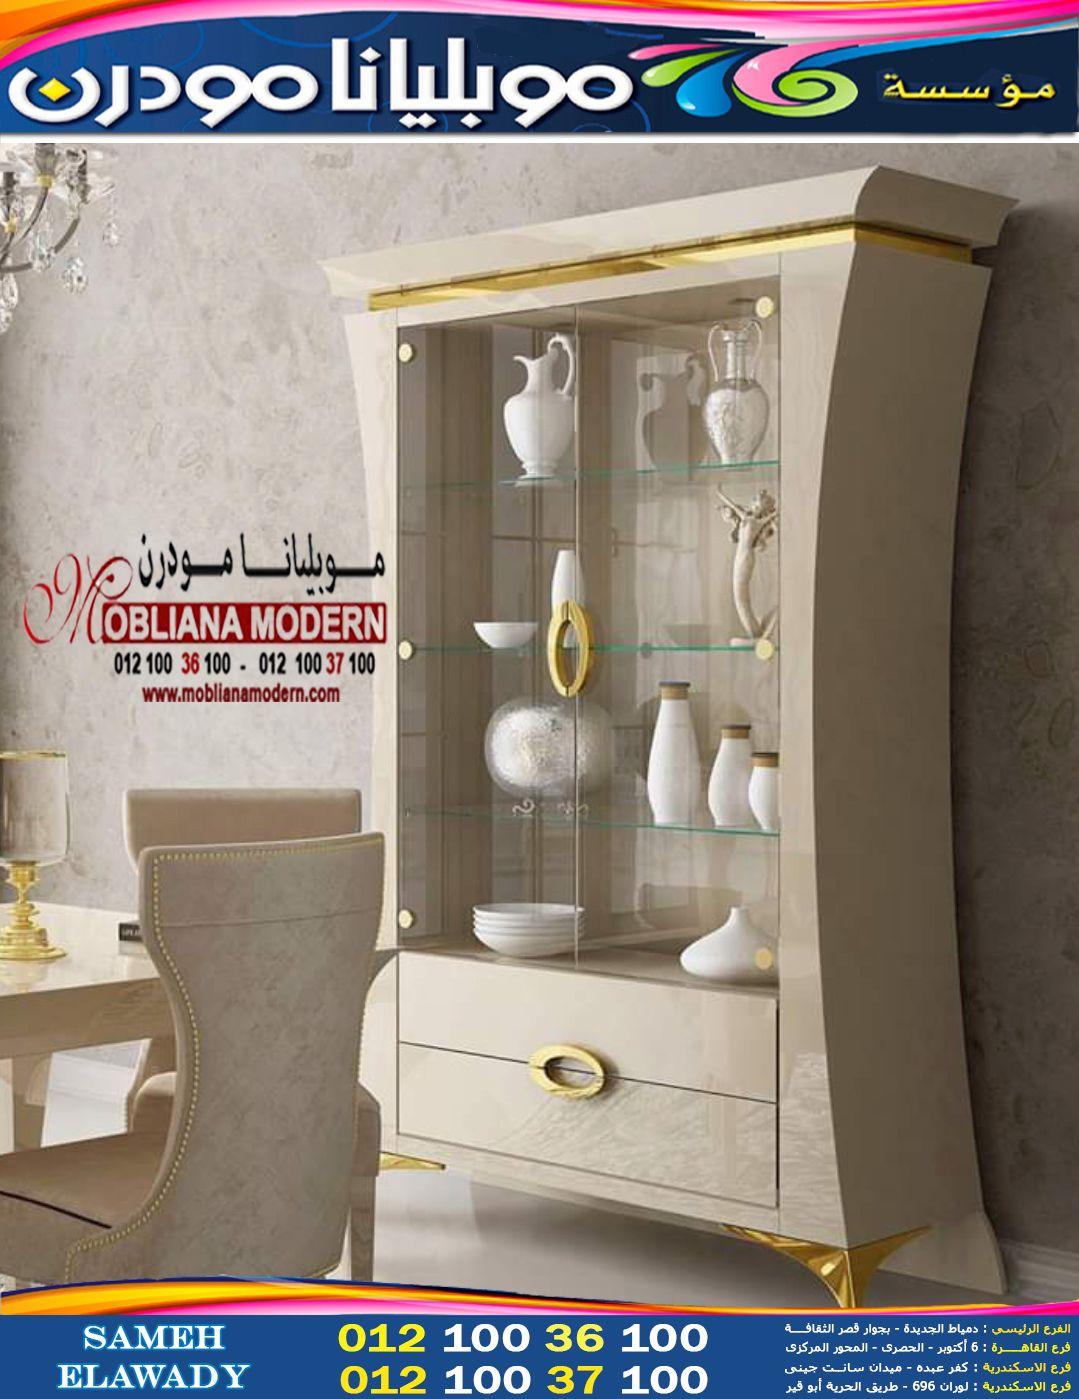 نيش مودرن 2022 2024 غرف سفرة كاملة Room Home Decor Furniture